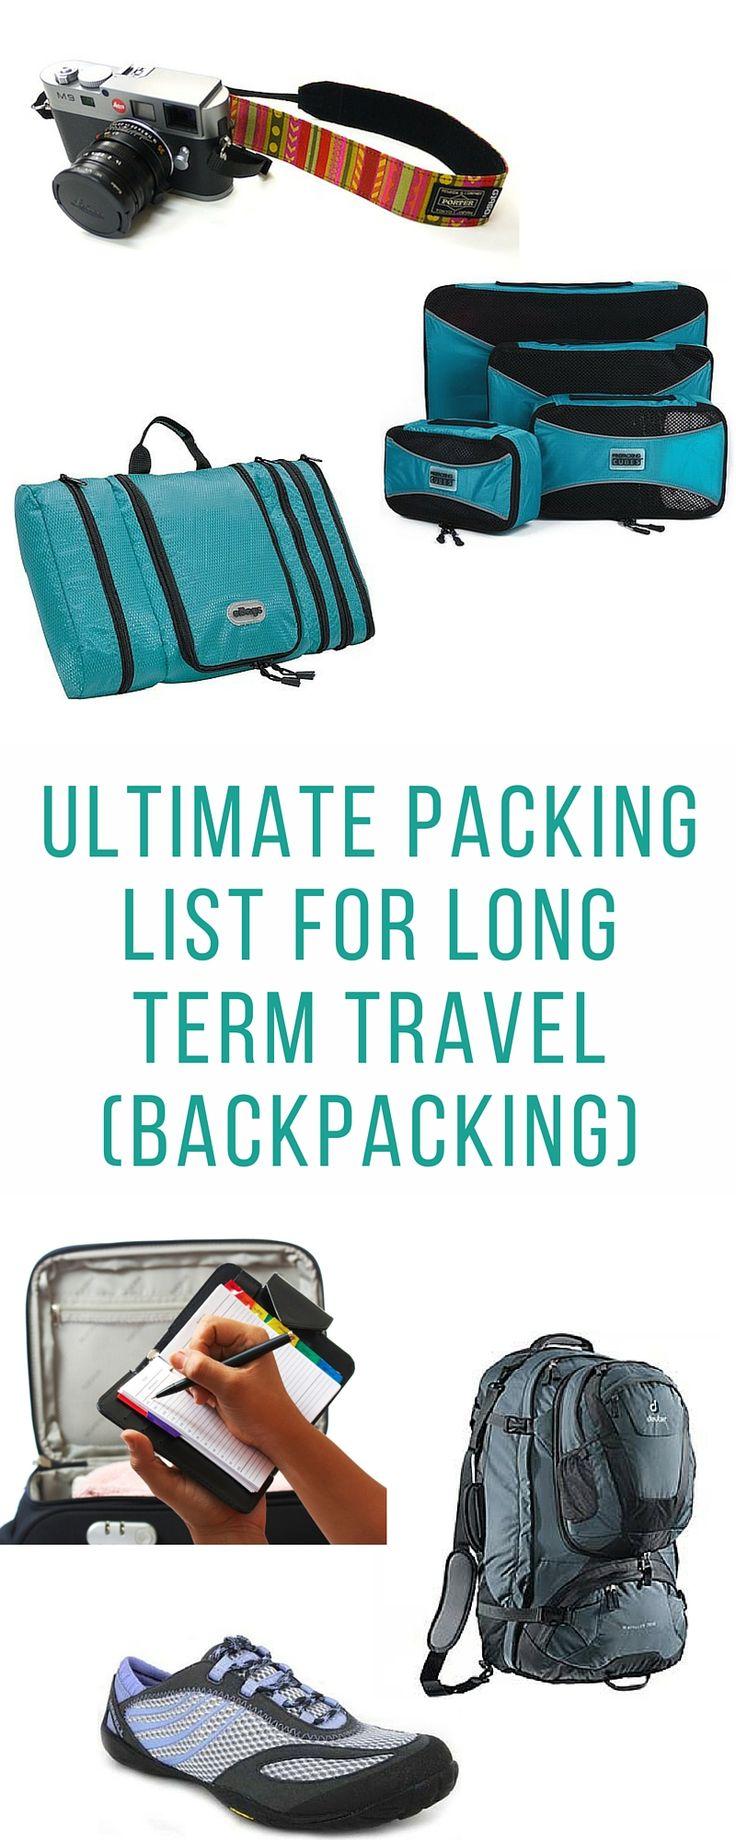 best 25 travel backpack ideas on pinterest best travel backpack best travel bags and. Black Bedroom Furniture Sets. Home Design Ideas